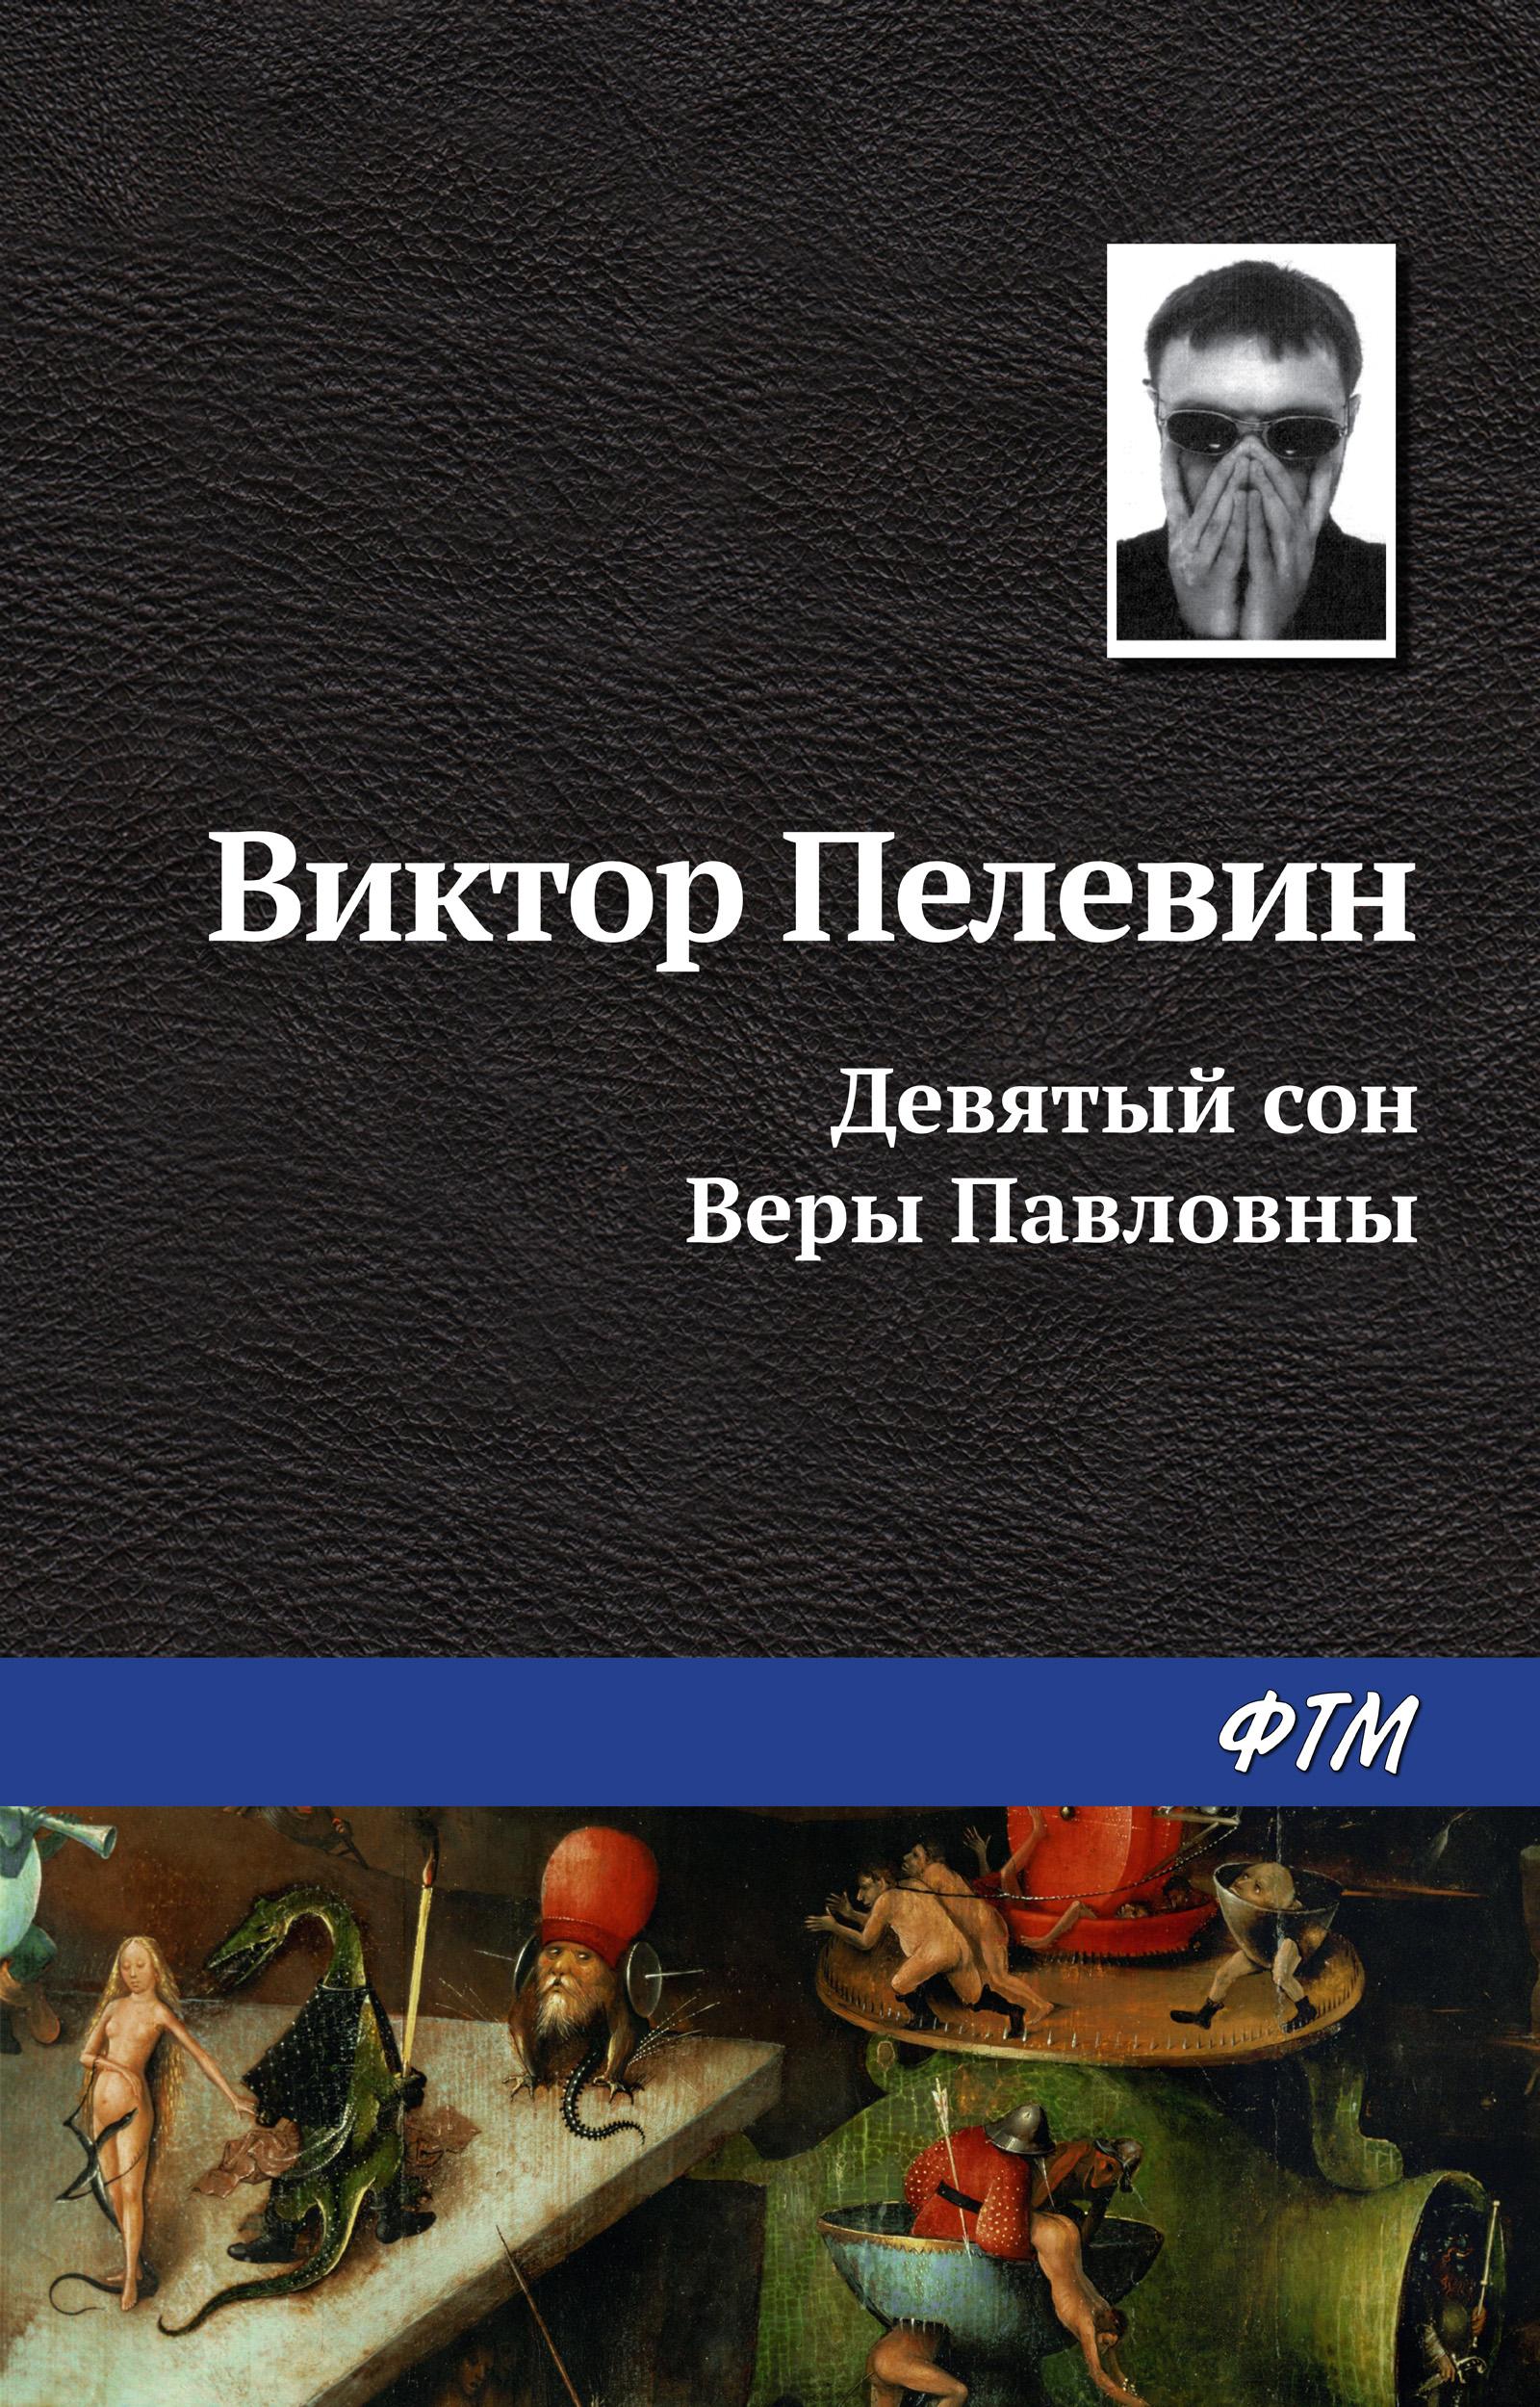 Виктор Пелевин Девятый сон Веры Павловны виктор пелевин икстлан – петушки